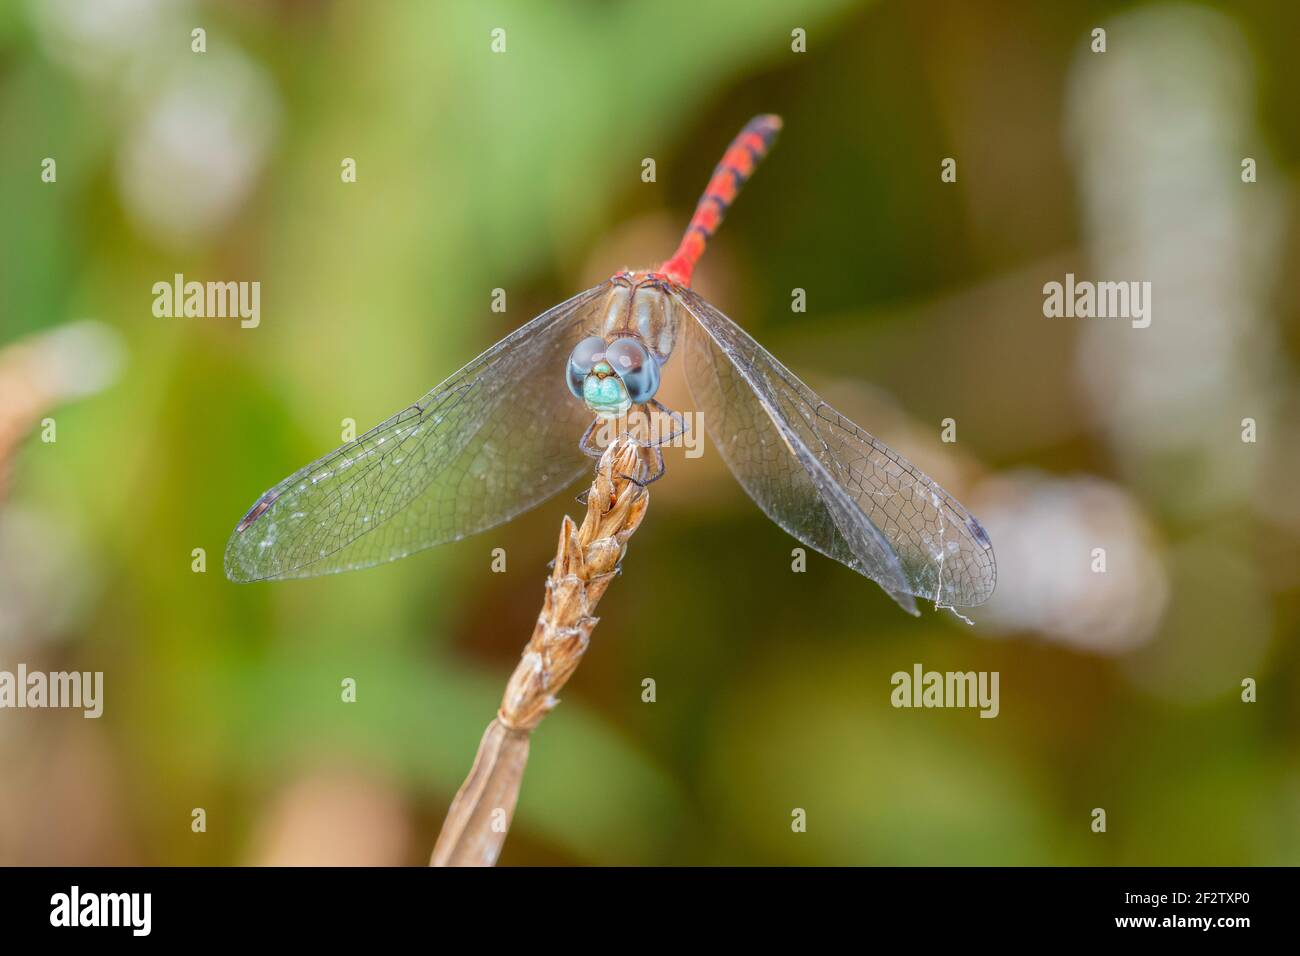 06652-00808 macho de cara azul Meadowhawk (Sympetrum ambiguum) en el humedal Marion Co. IL Foto de stock